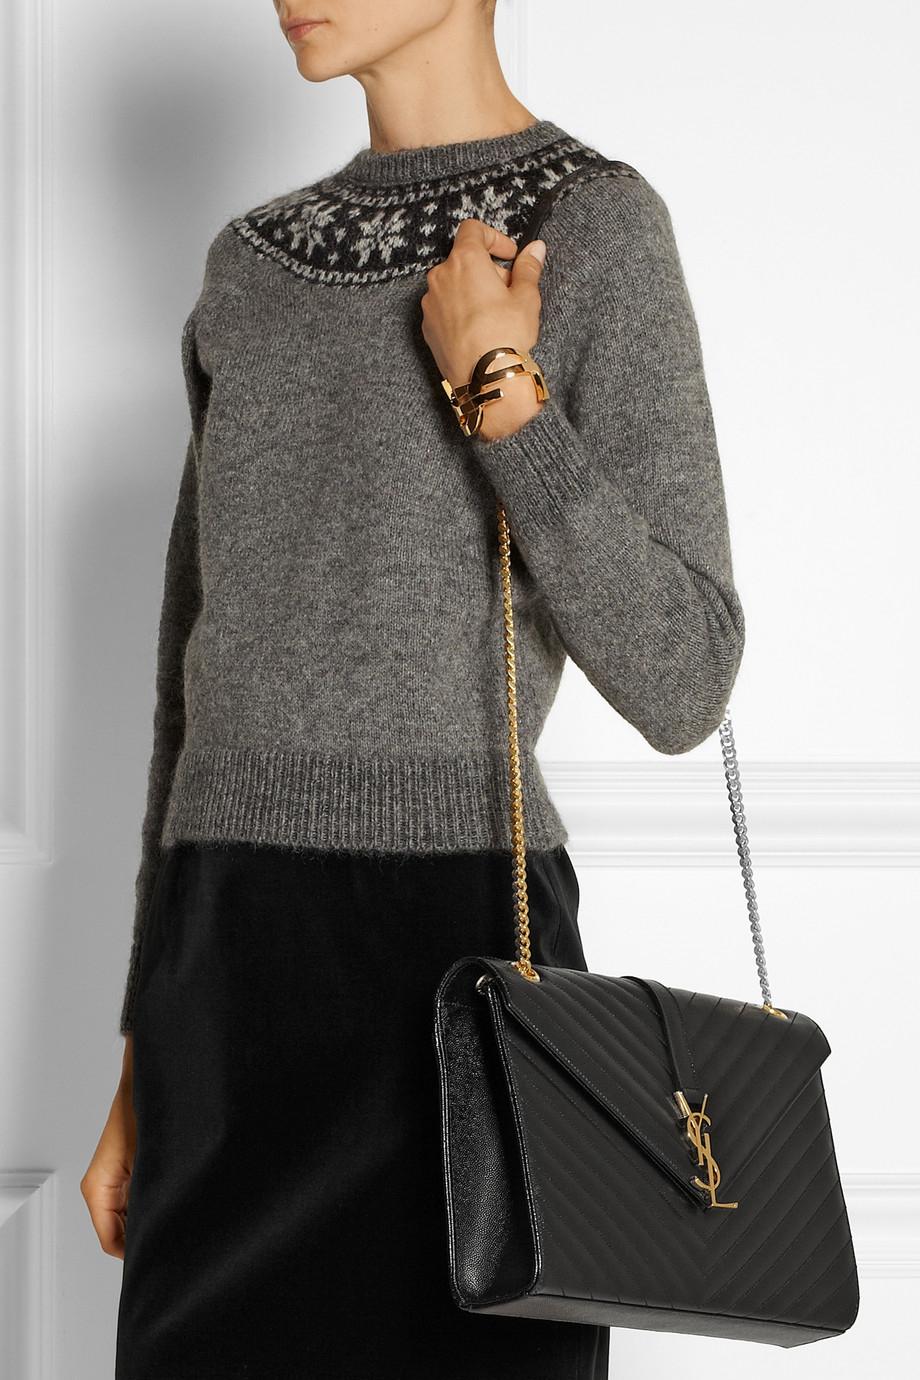 6becdc3d53aa0 Saint Laurent Sunset Small Textured-leather Shoulder Bag